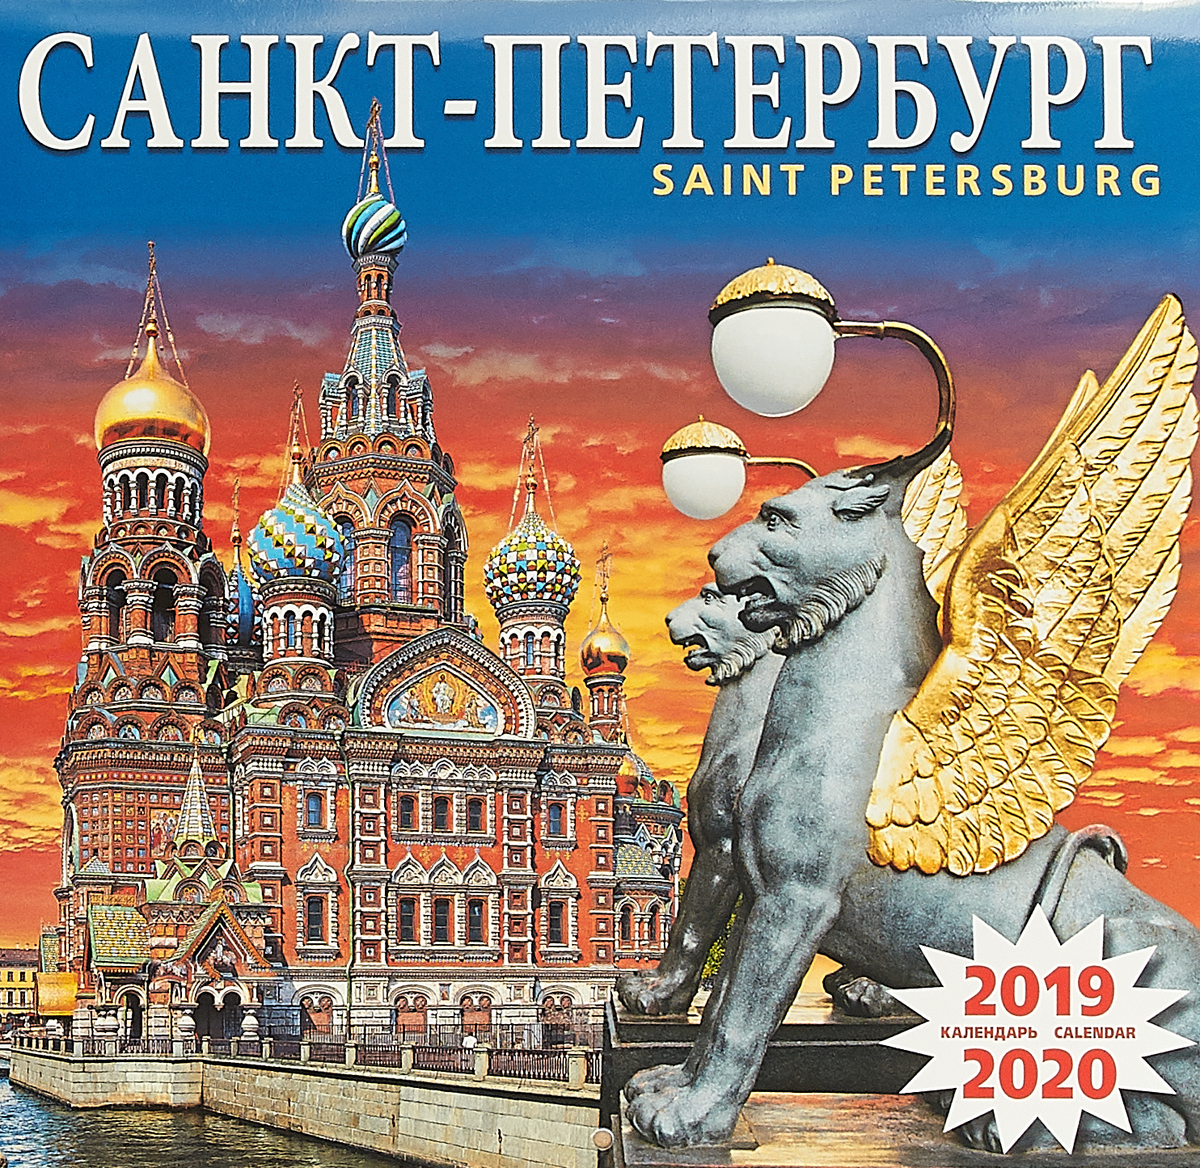 Календарь на скрепке на 2019-2020 год. Спас-на-крови